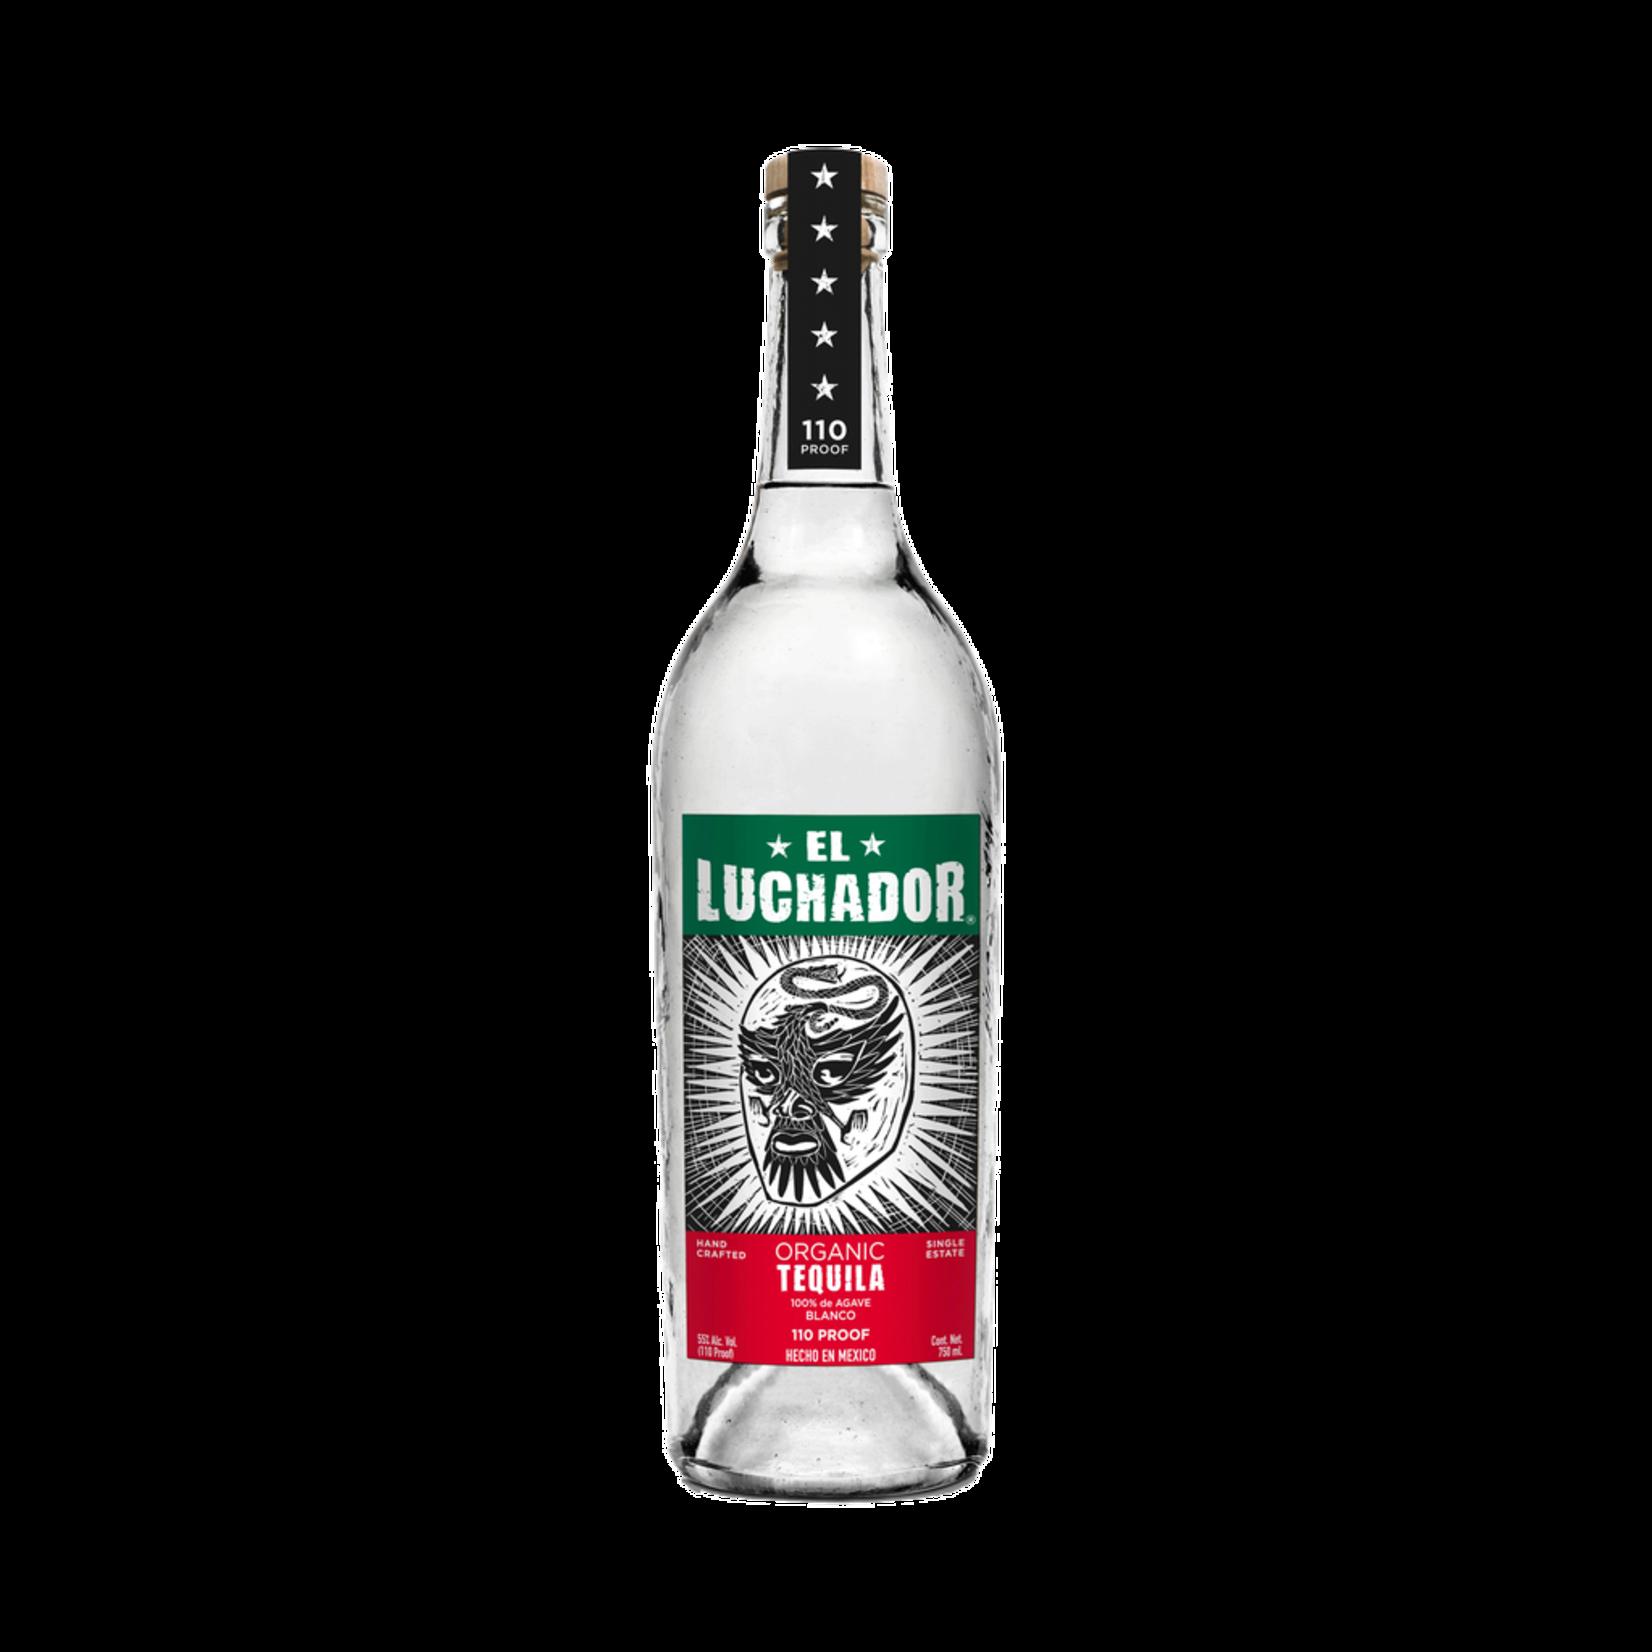 Spirits 123 Organic Tequila El Luchador Blanco Tequila 110 Proof